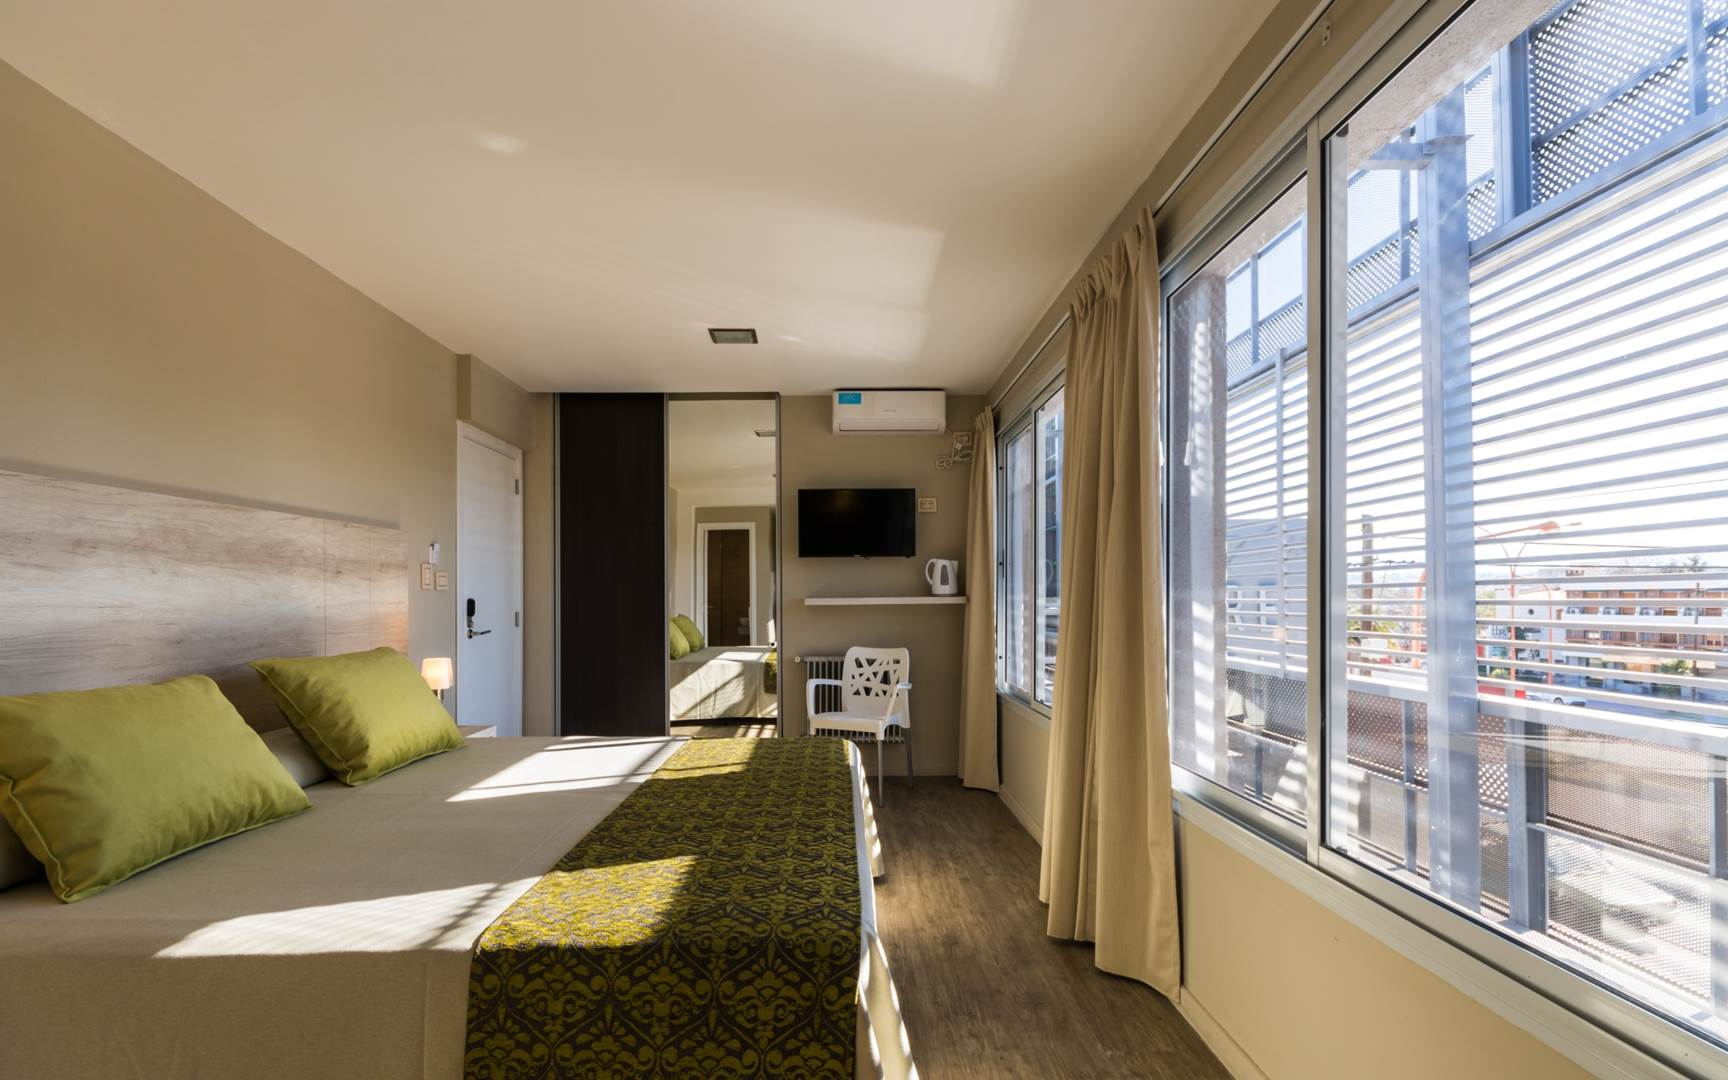 100917  -  HOTEL ALPRE ph1 G Viramonte-1672 (Copy)